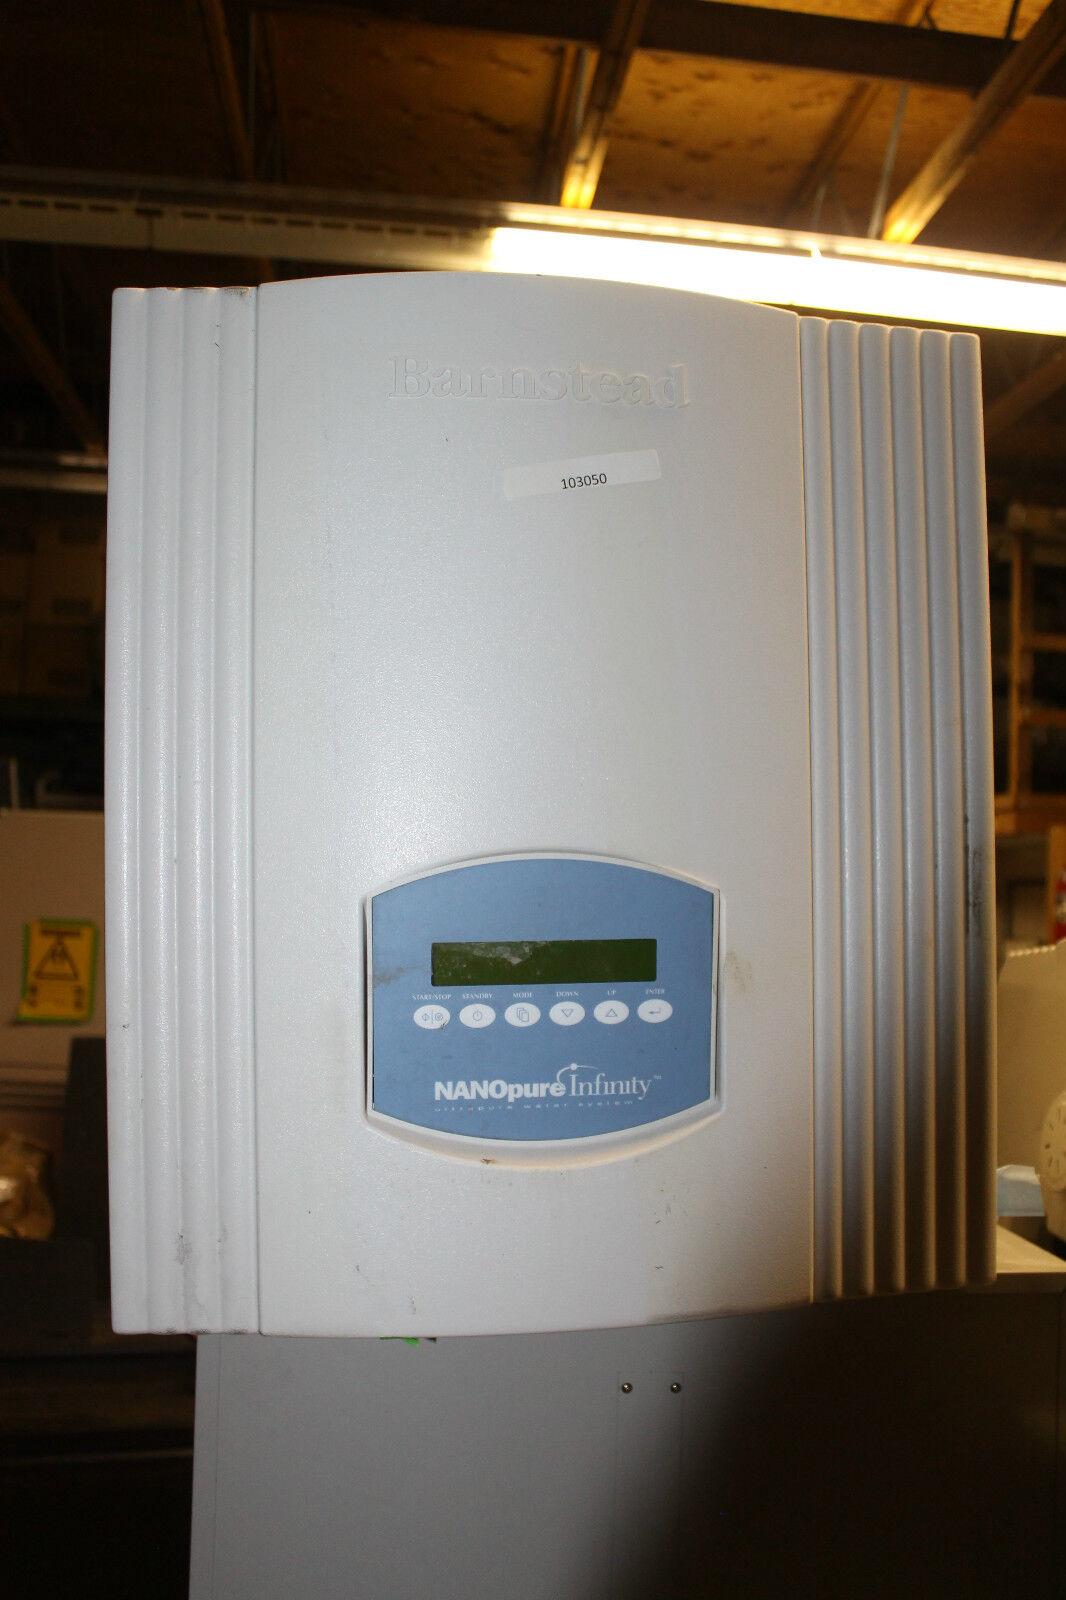 BARNSTEAD NANOPURE INFINITY ULTRAPURE D8961 Purificateur